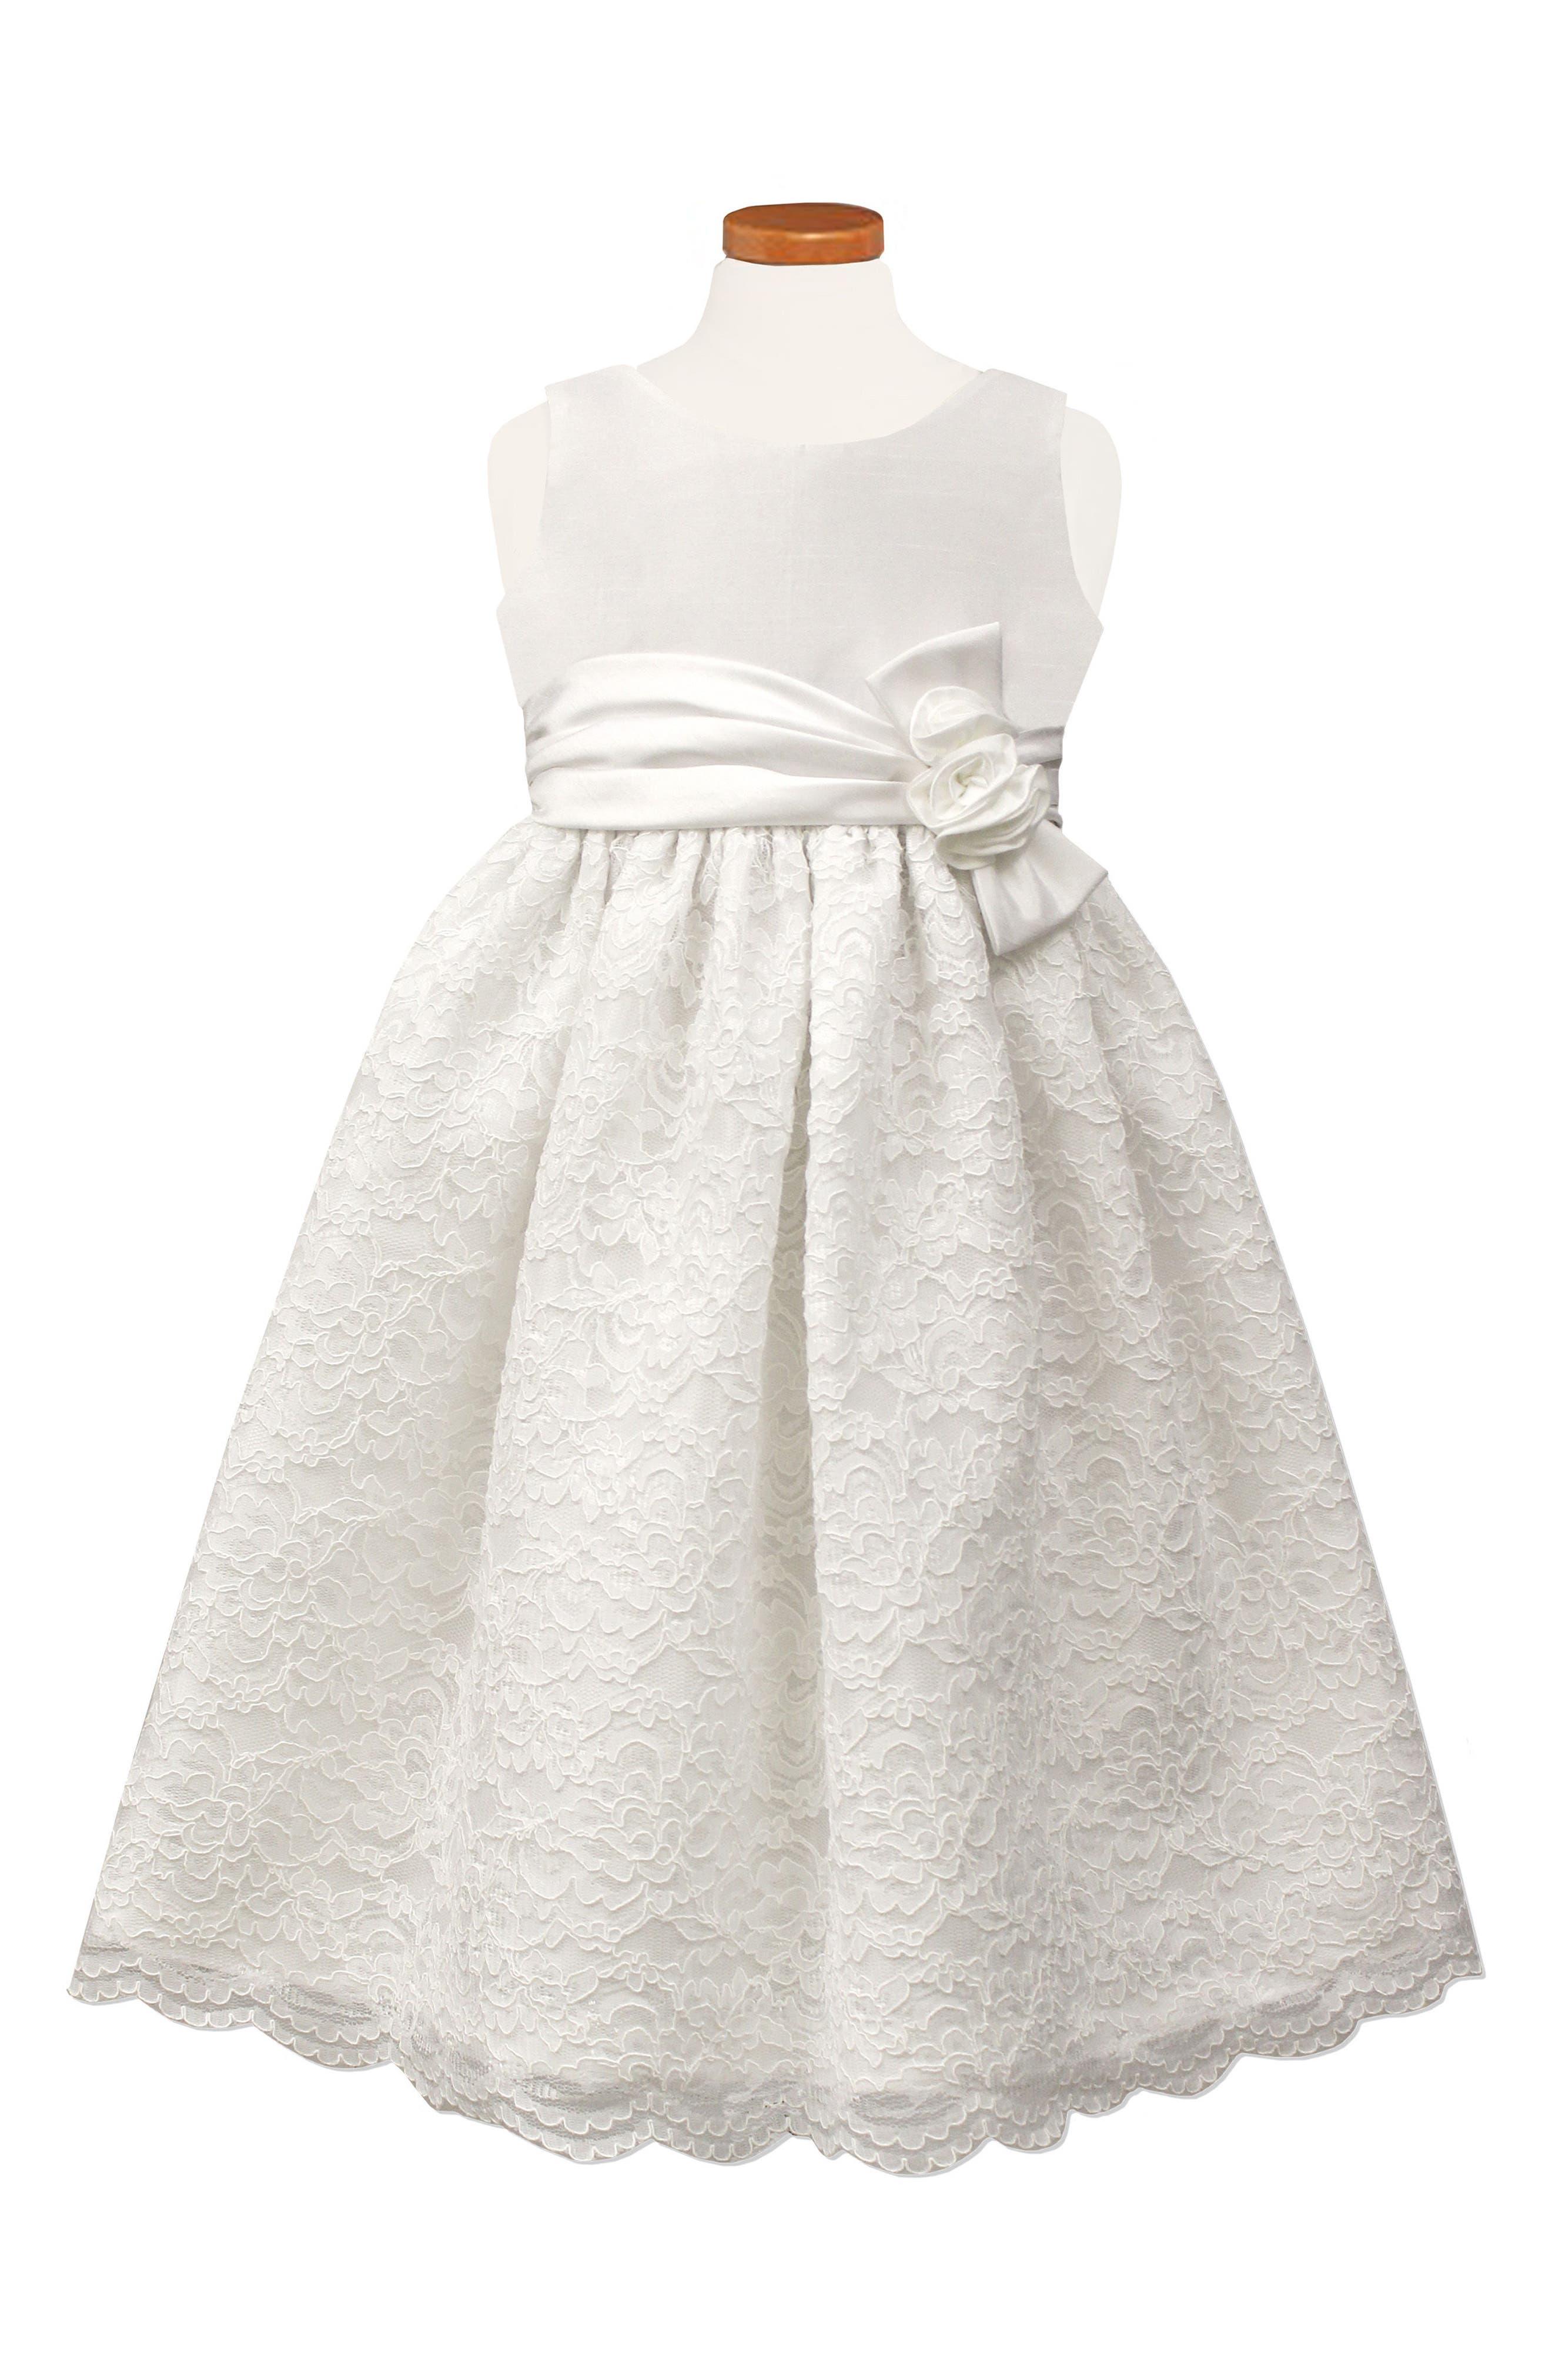 Sorbet Satin & Lace Party Dress (Big Girls)